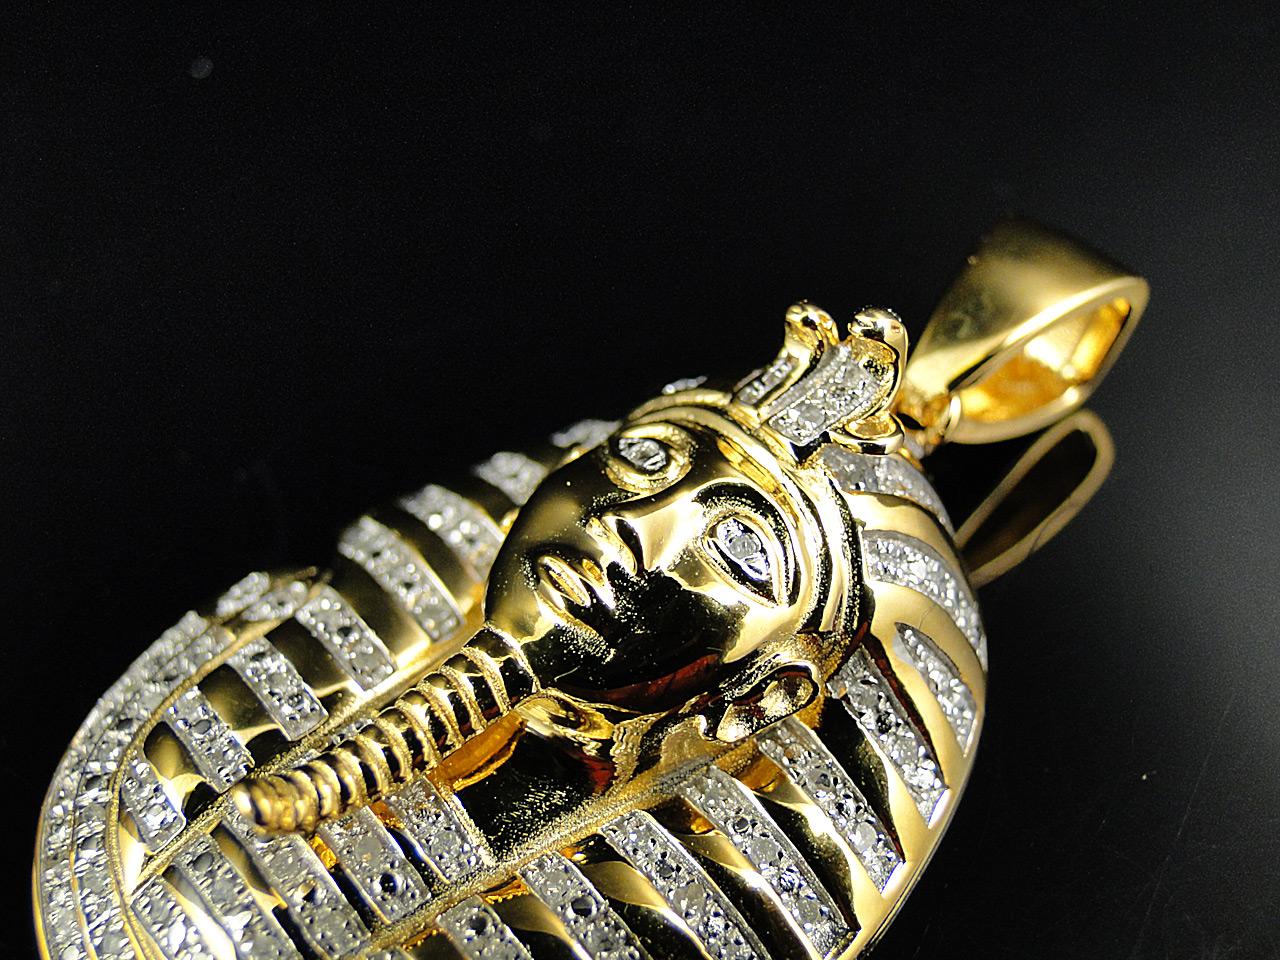 925 silver king tut tutankhamun real diamond pendant chain 925 silver king tut tutankhamun real diamond pendant chain yellow gold finish mozeypictures Gallery